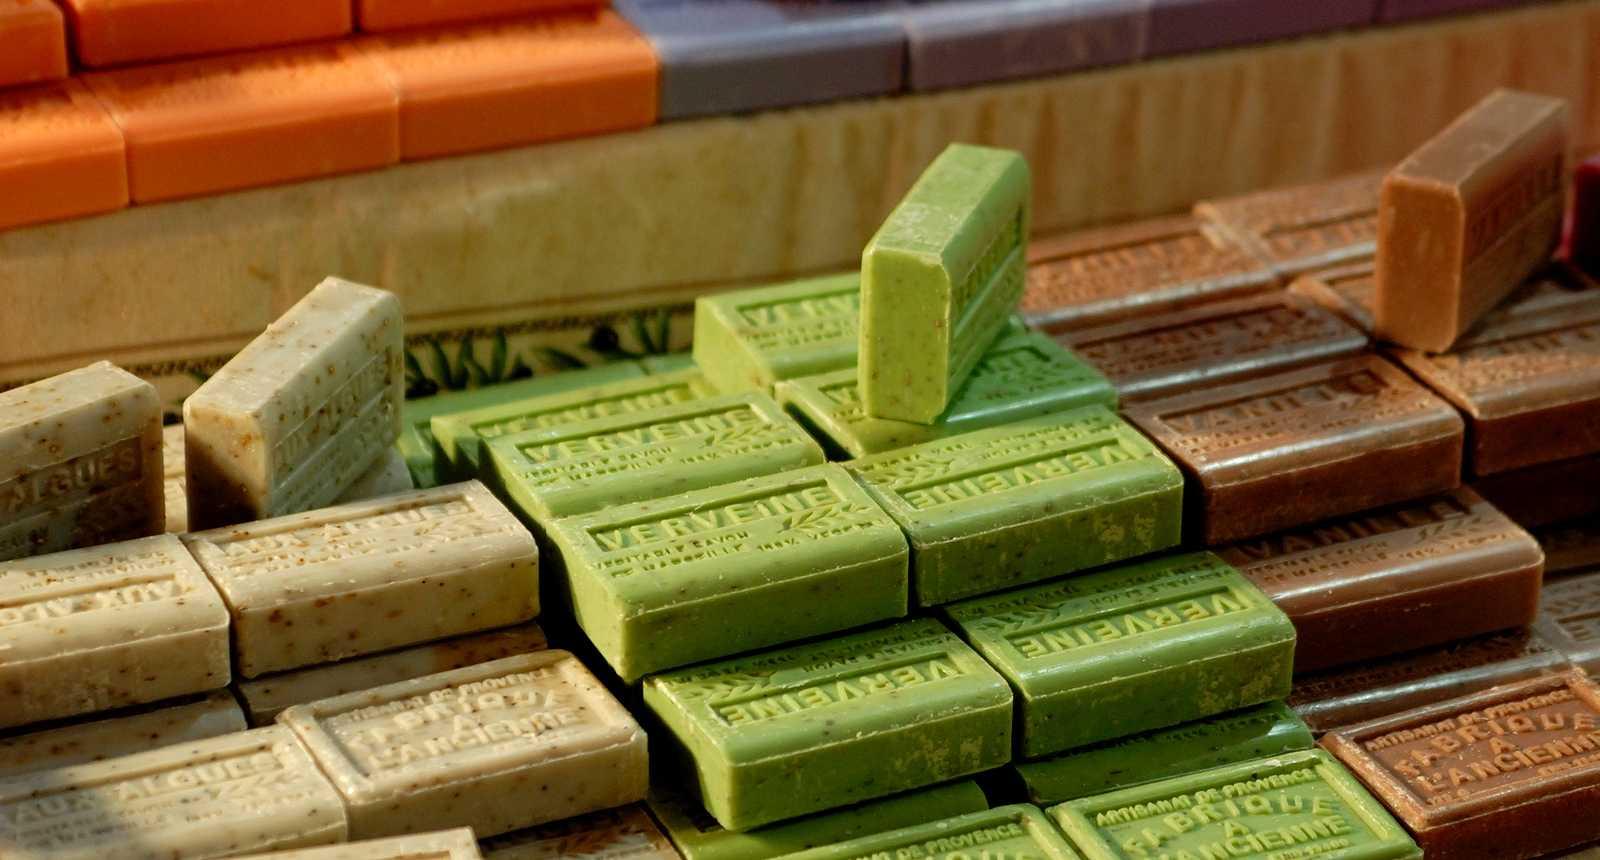 Pains de savon de Marseille, fabrication artisanale